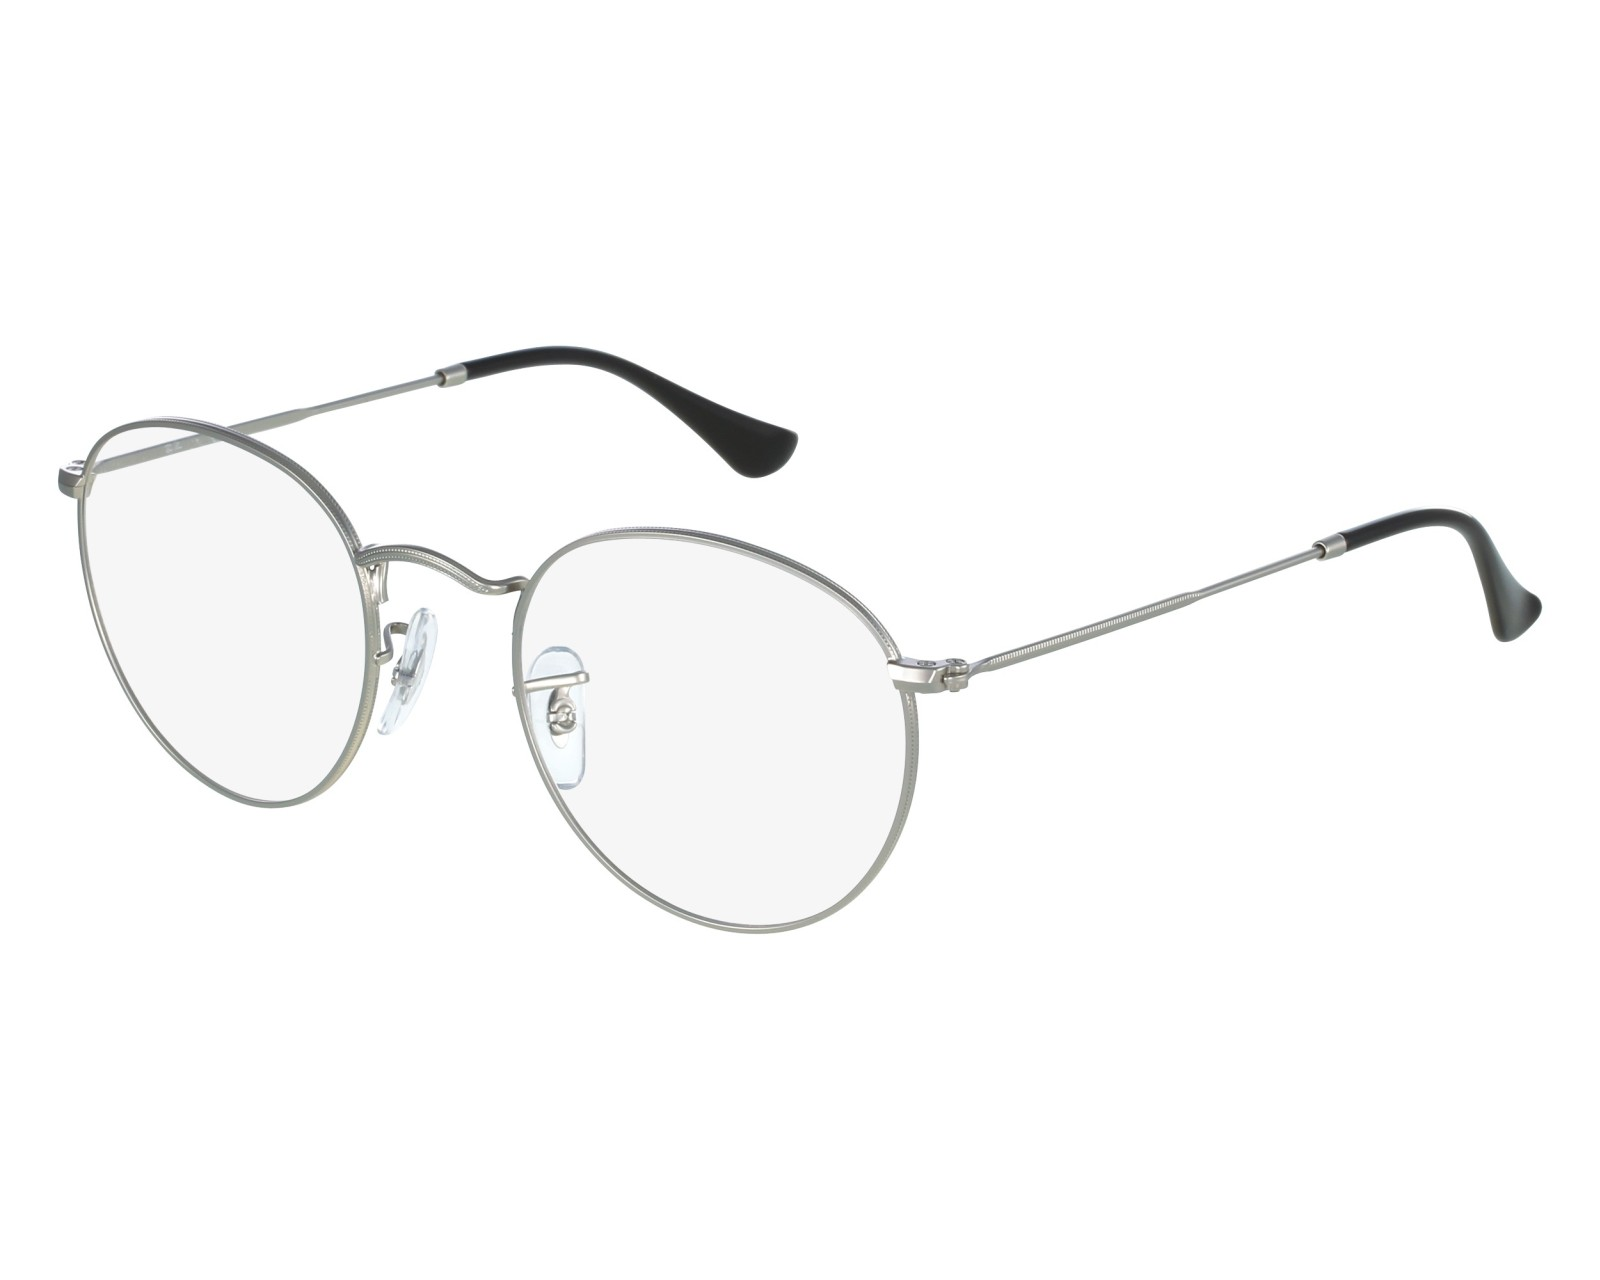 161d6de8df1 thumbnail eyeglasses Ray-Ban RX-3447-V 2538 - Silver front view